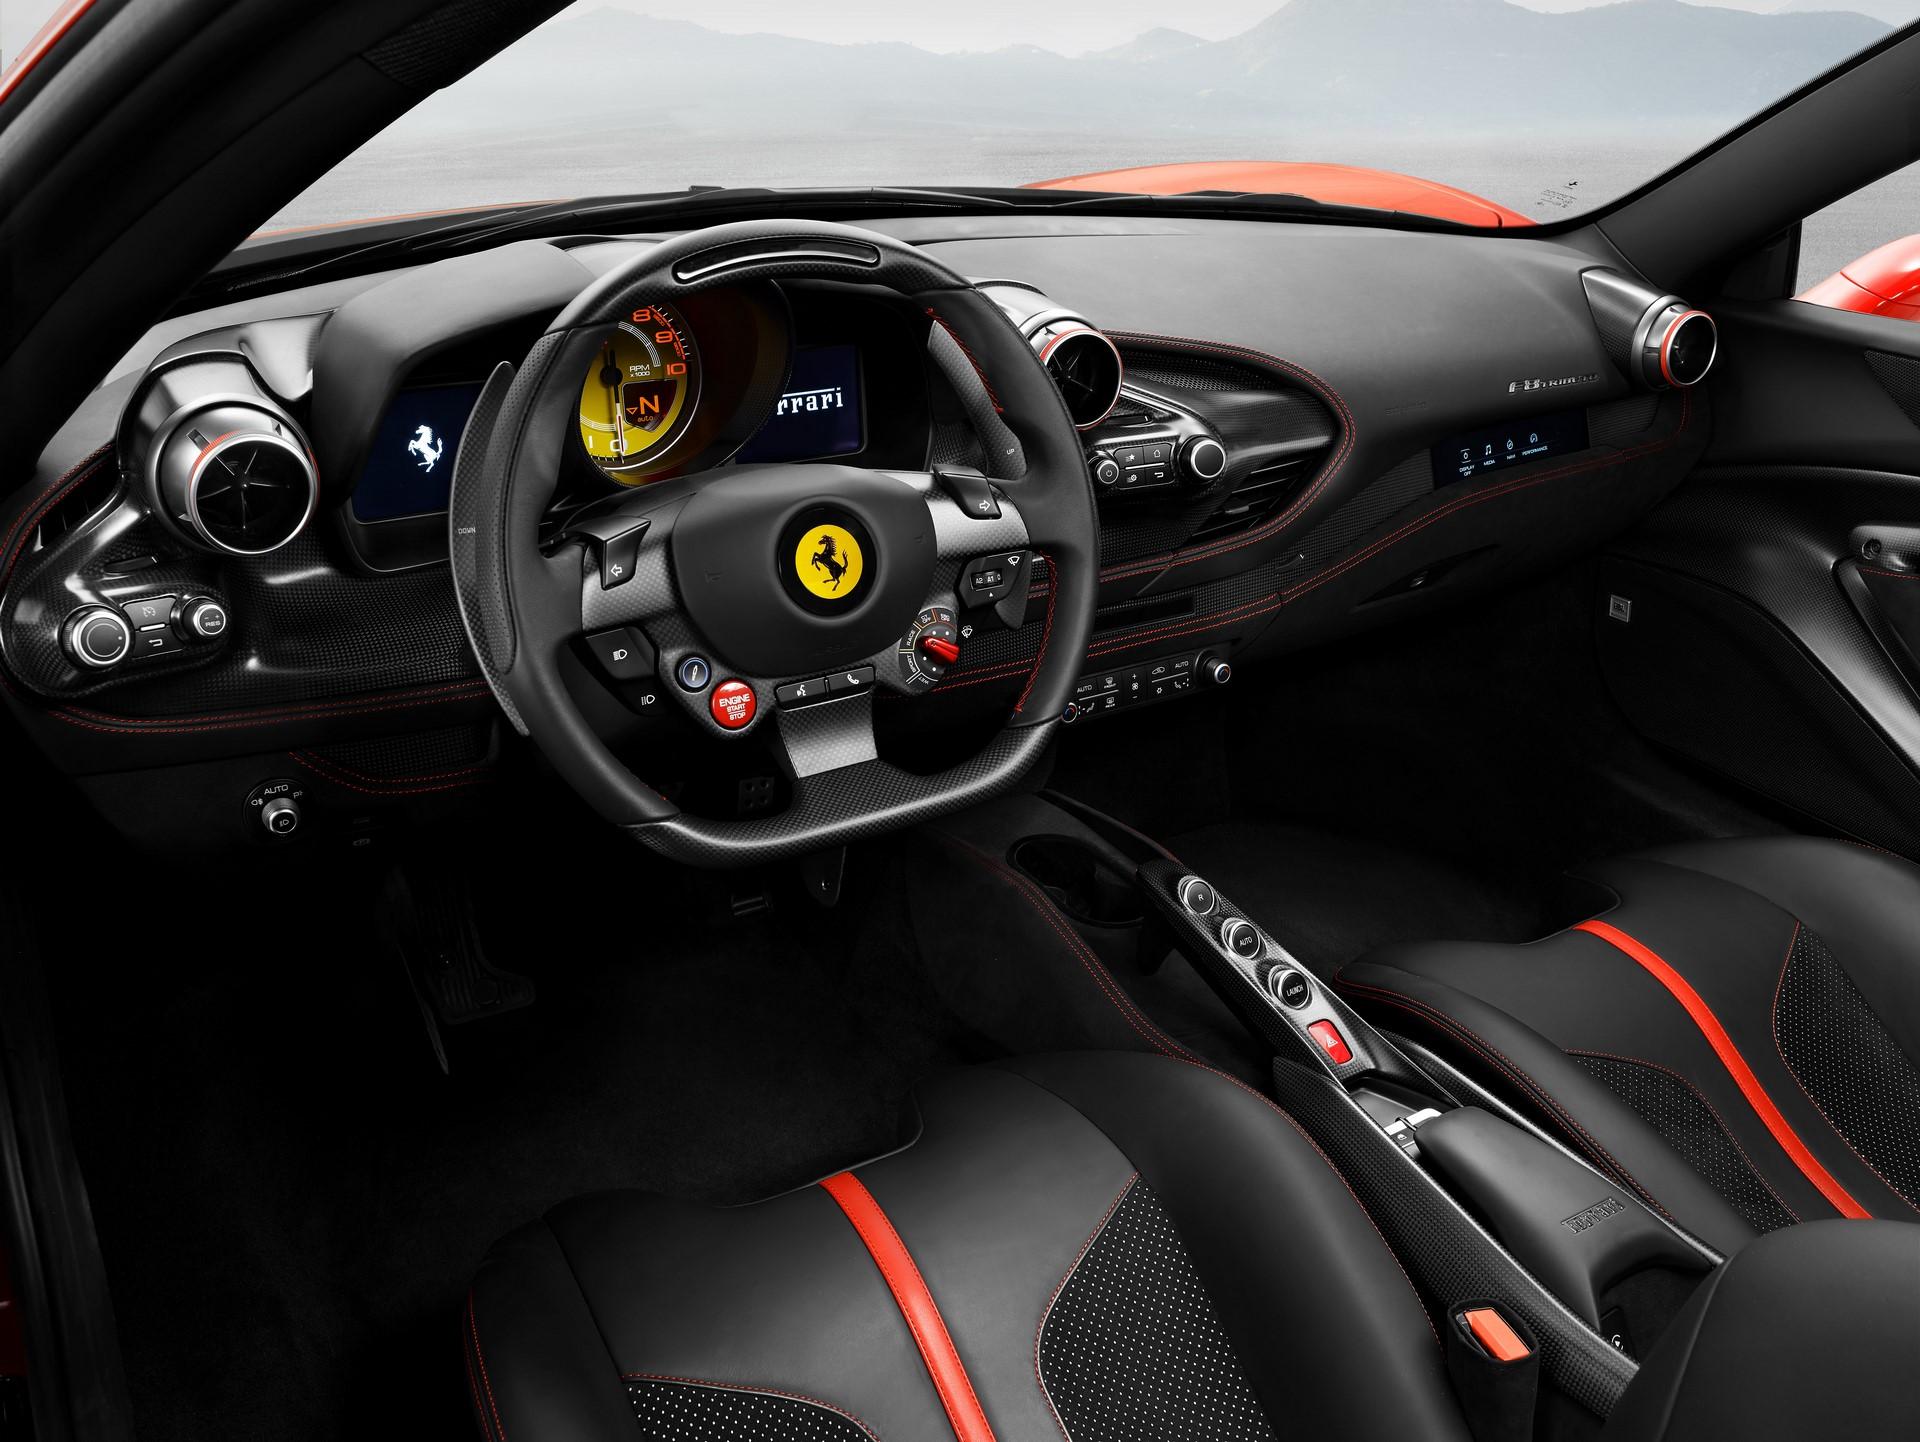 Ferrari F8 Tributo (6)